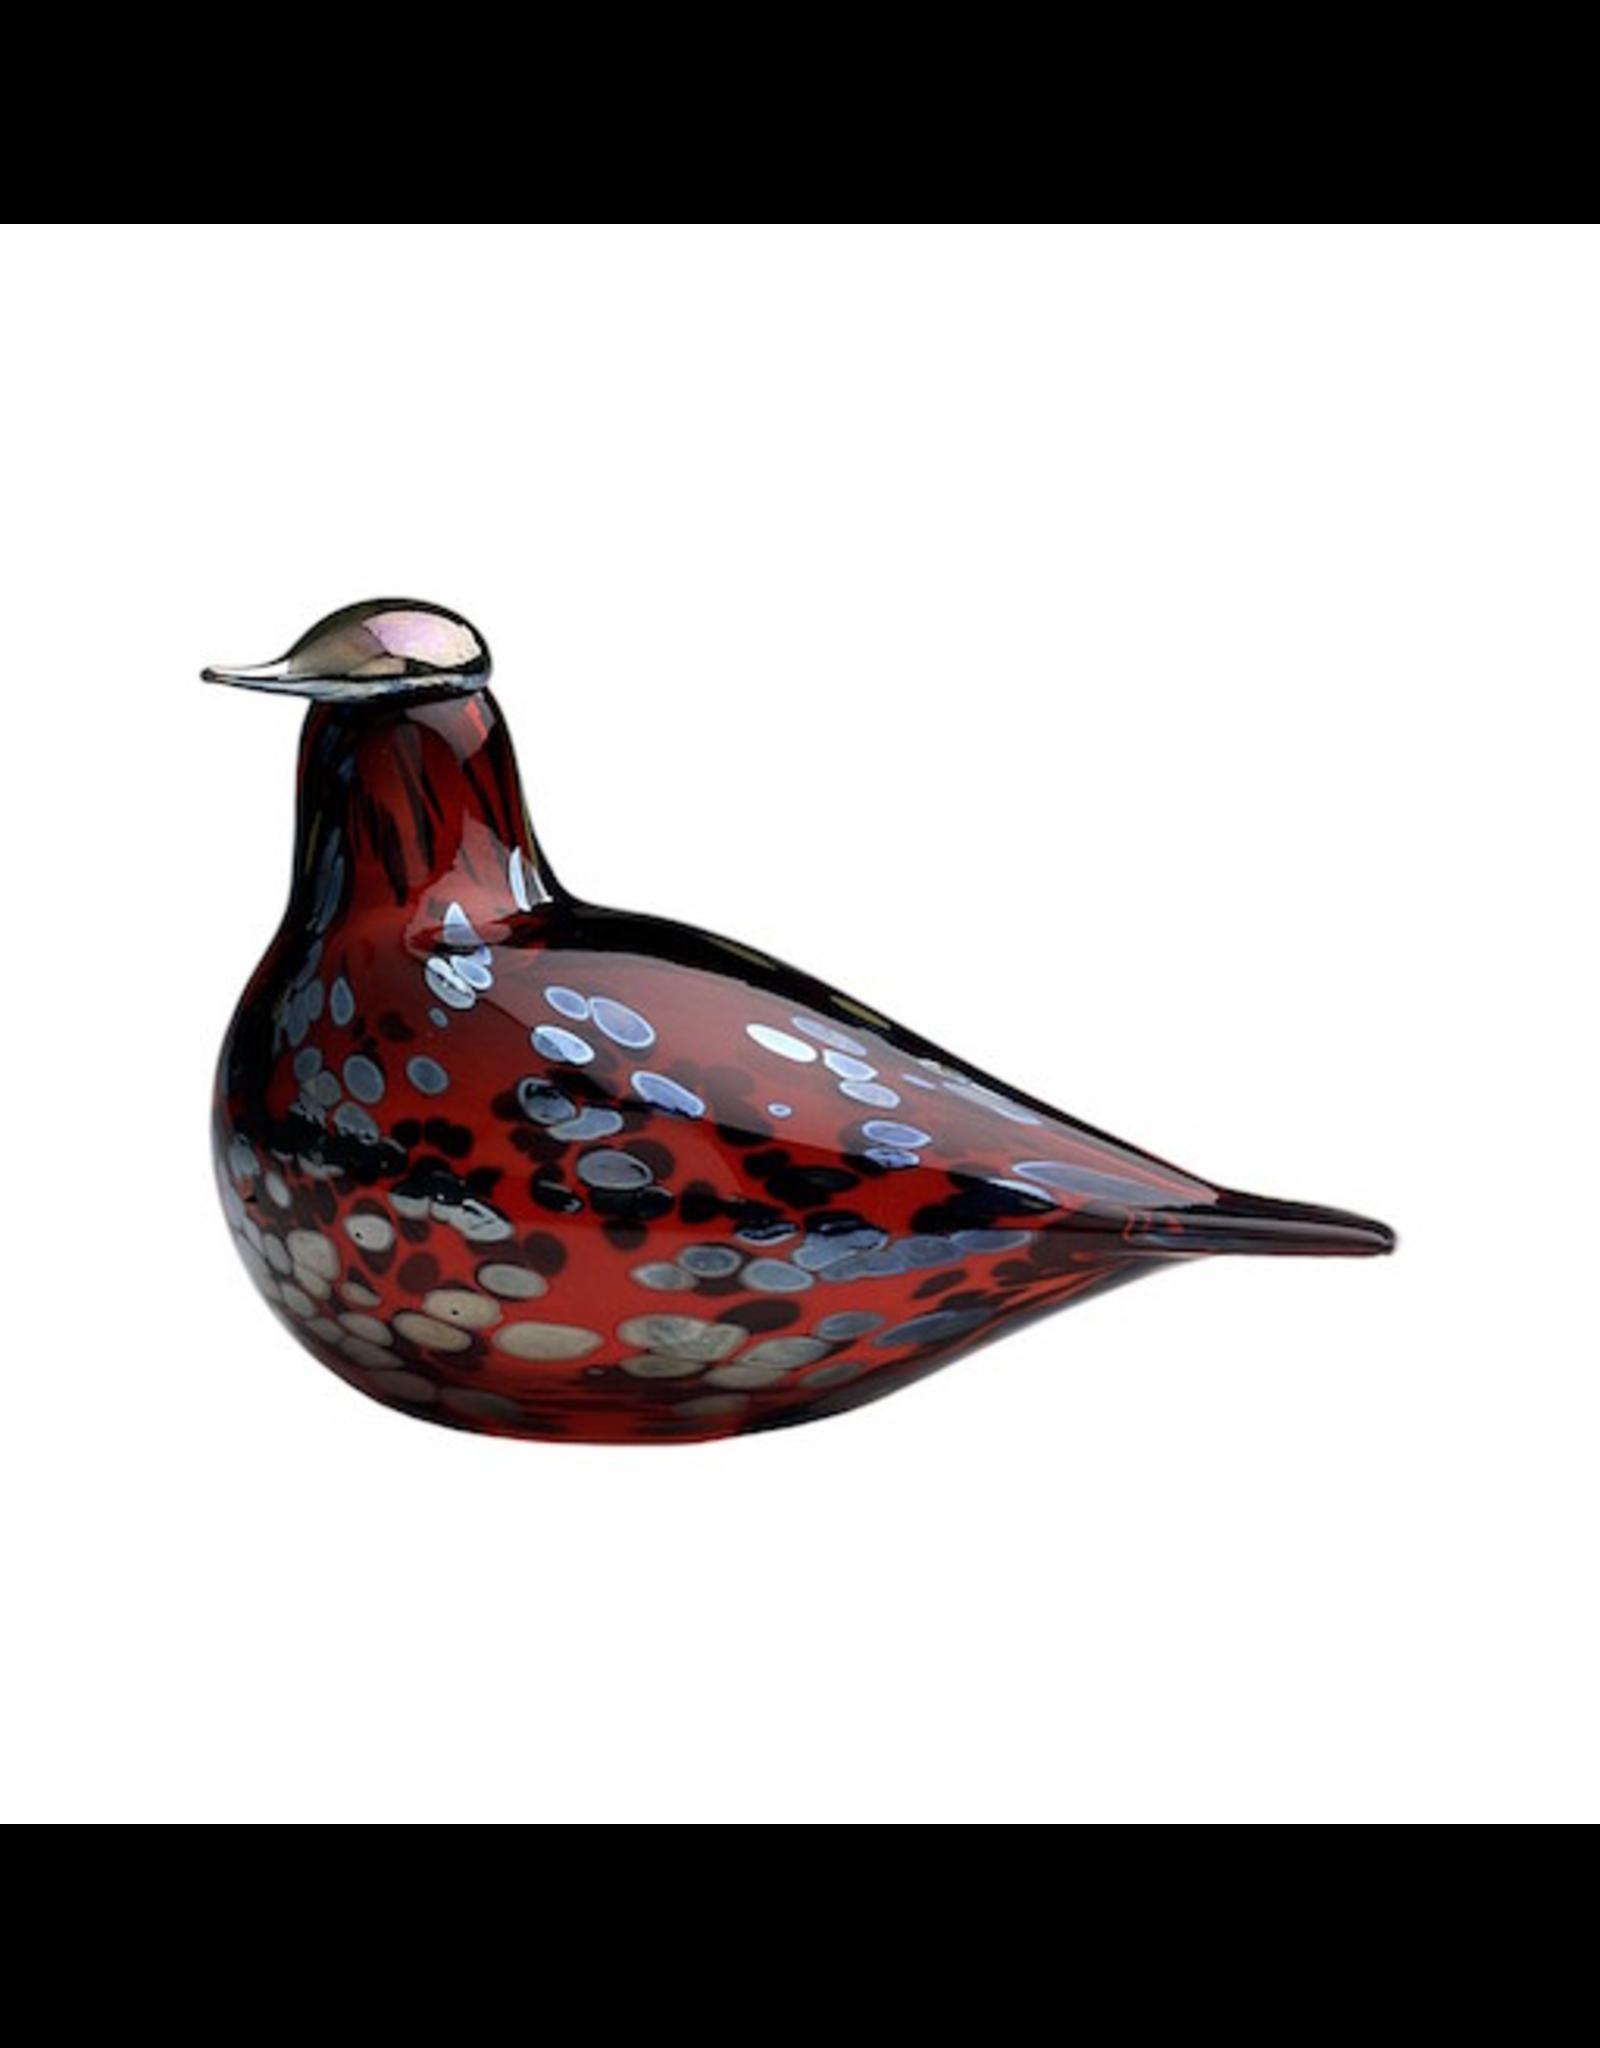 IITTALA RUBY BIRD CRANBERRY 蔓莓色红宝石鸟